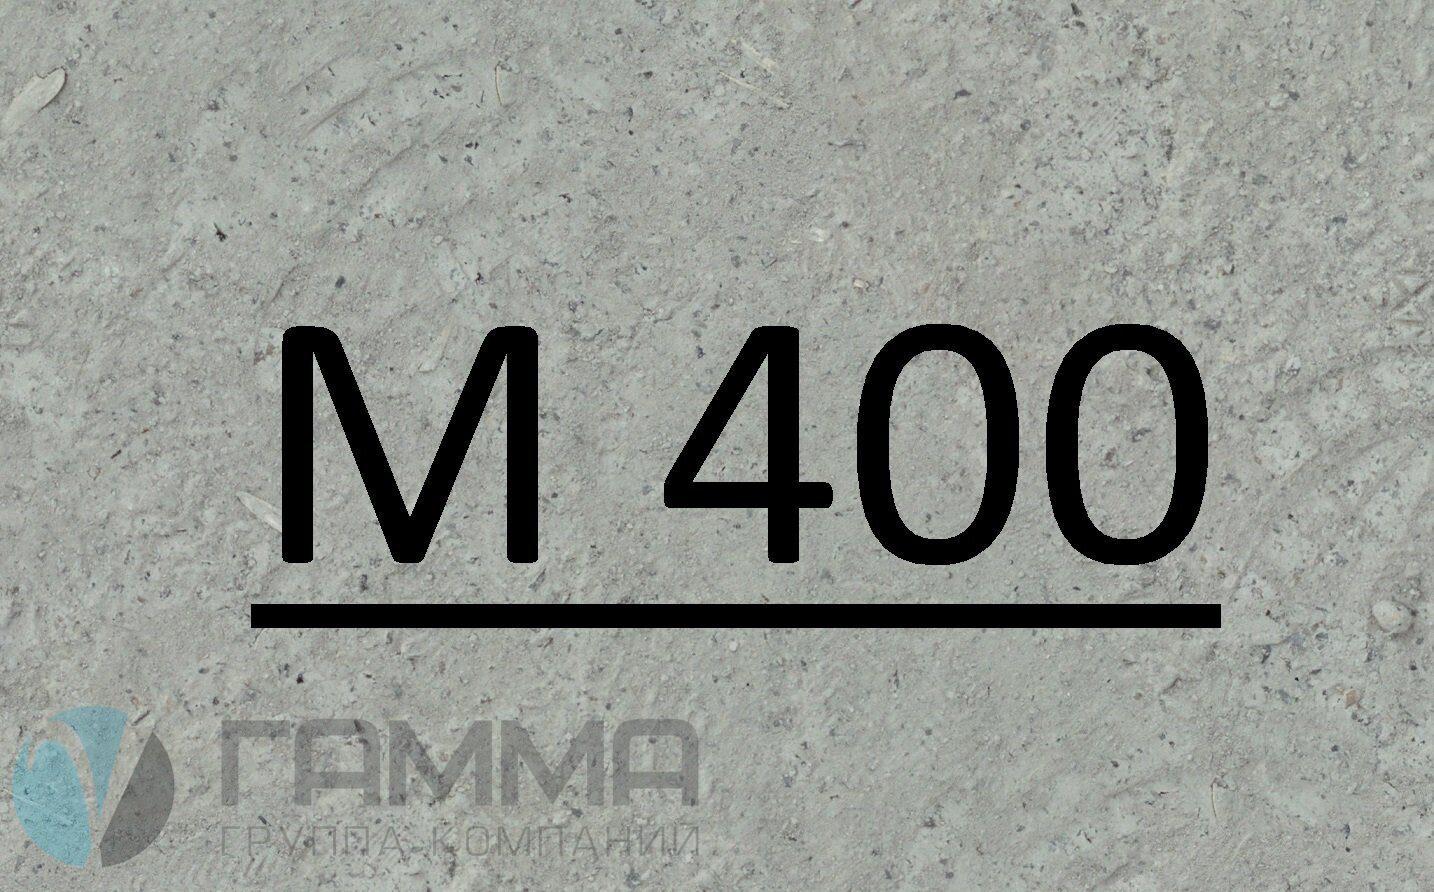 Бетон м400 купить екатеринбург купить коронка по бетону 68 мм цена